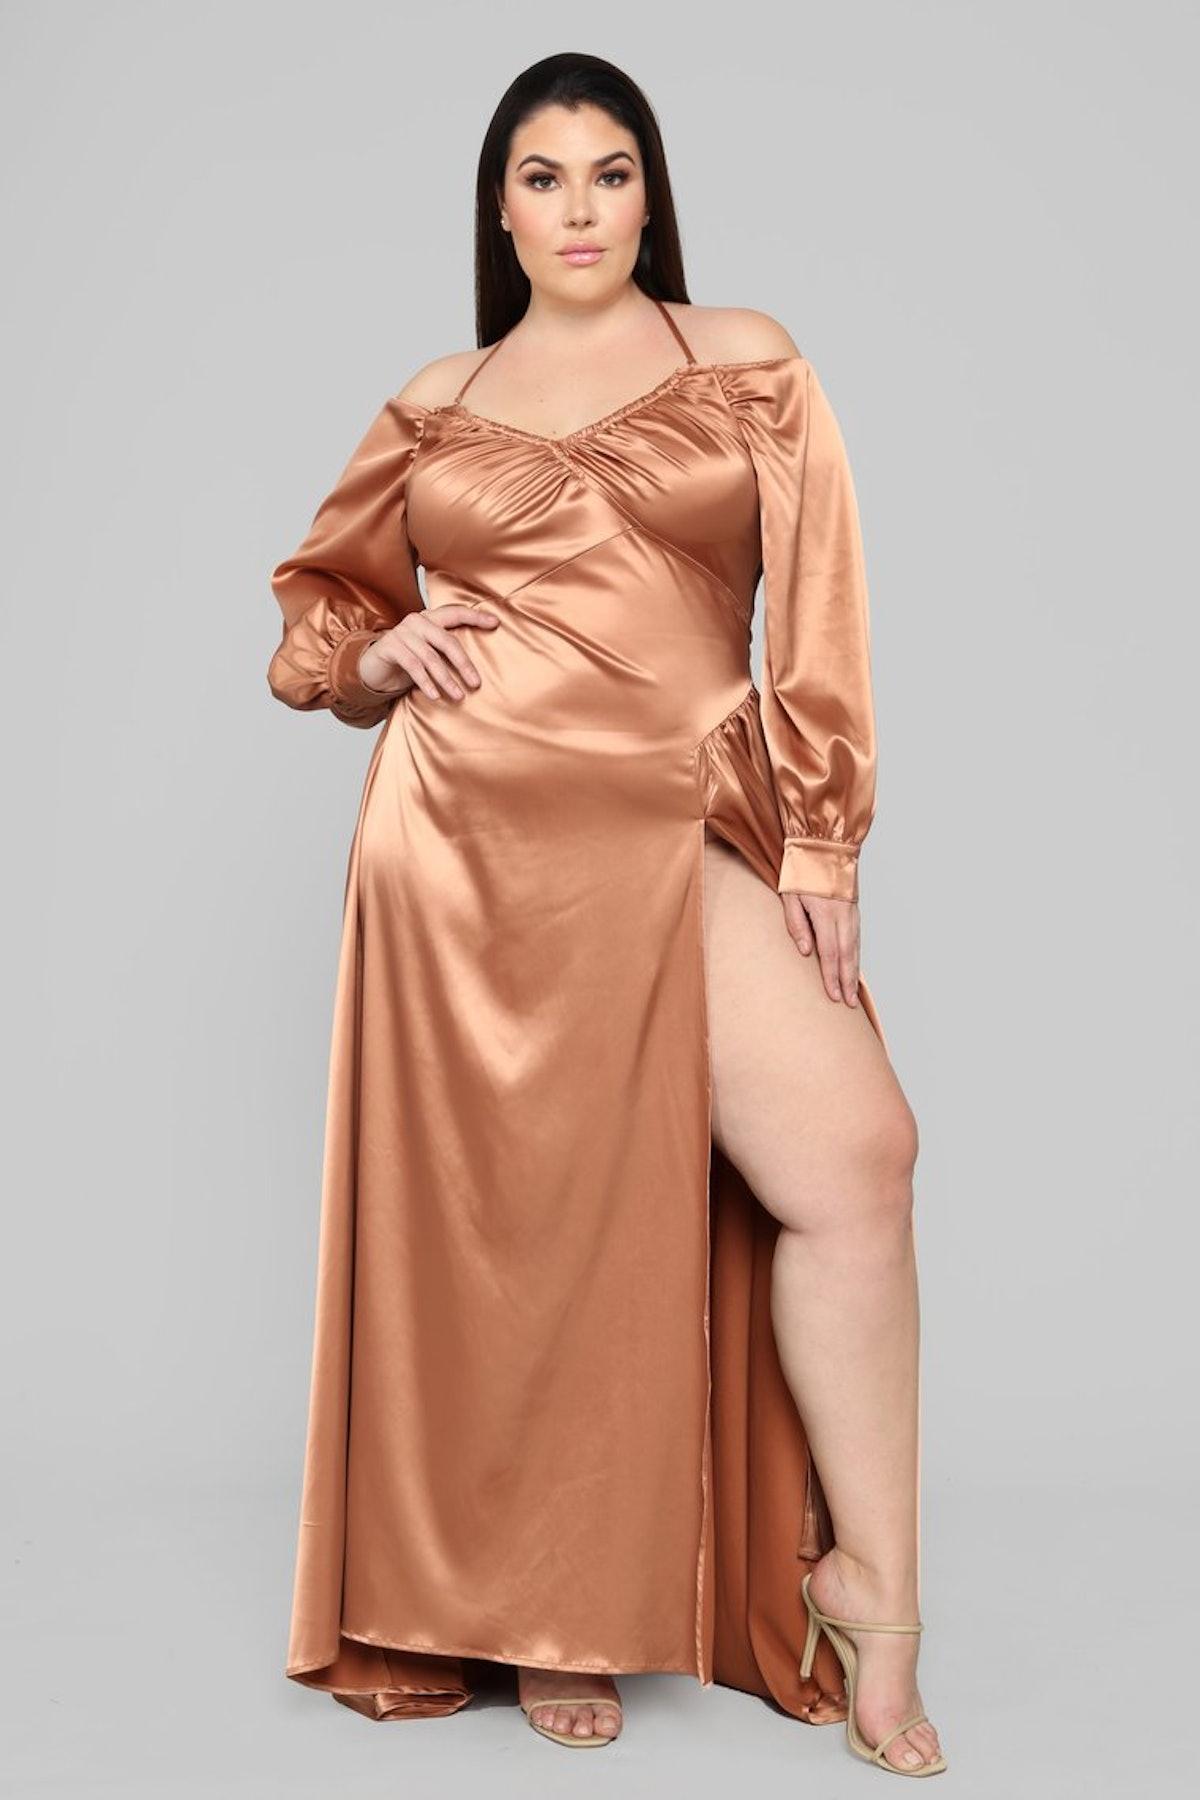 I Like Shinin' Maxi Dress - Bronze